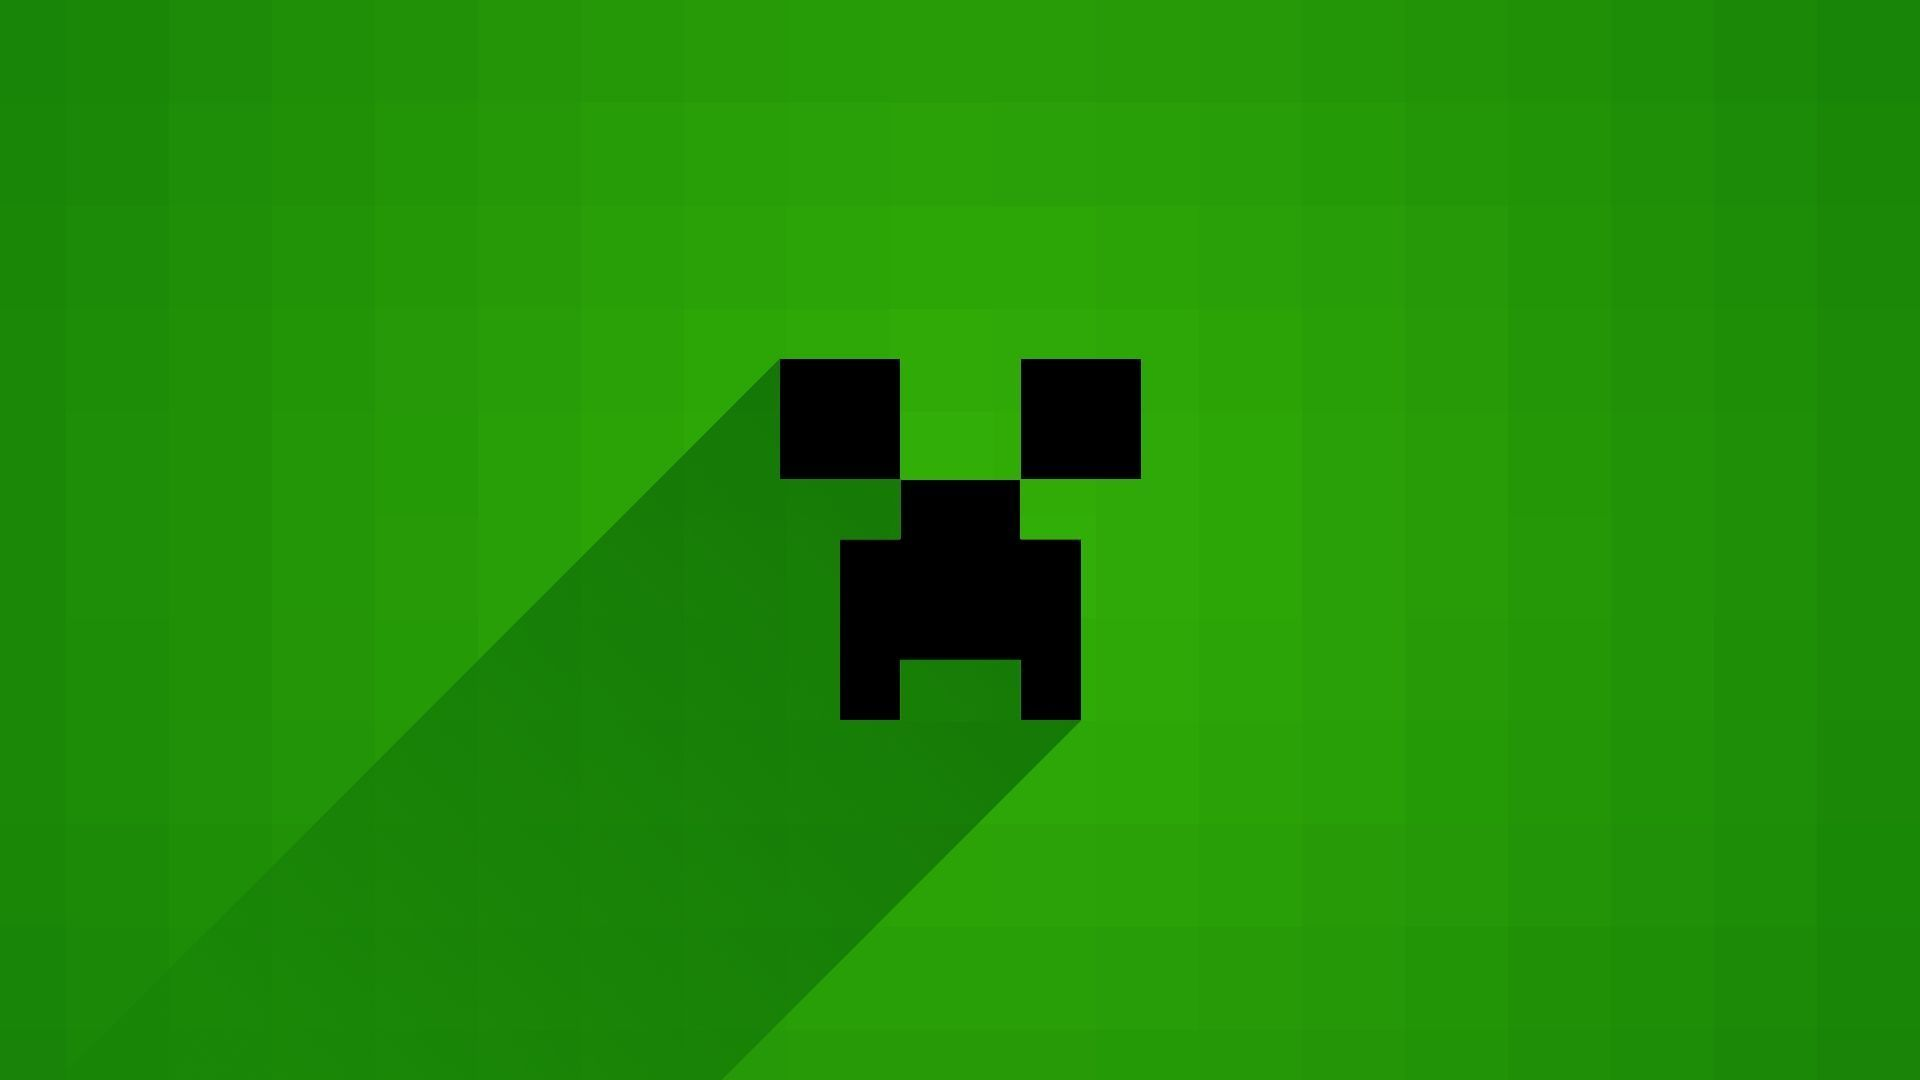 10 Best Minecraft Creeper Wallpapers Minecraftrs Com Minecraft Wallpaper Wallpaper Creepers